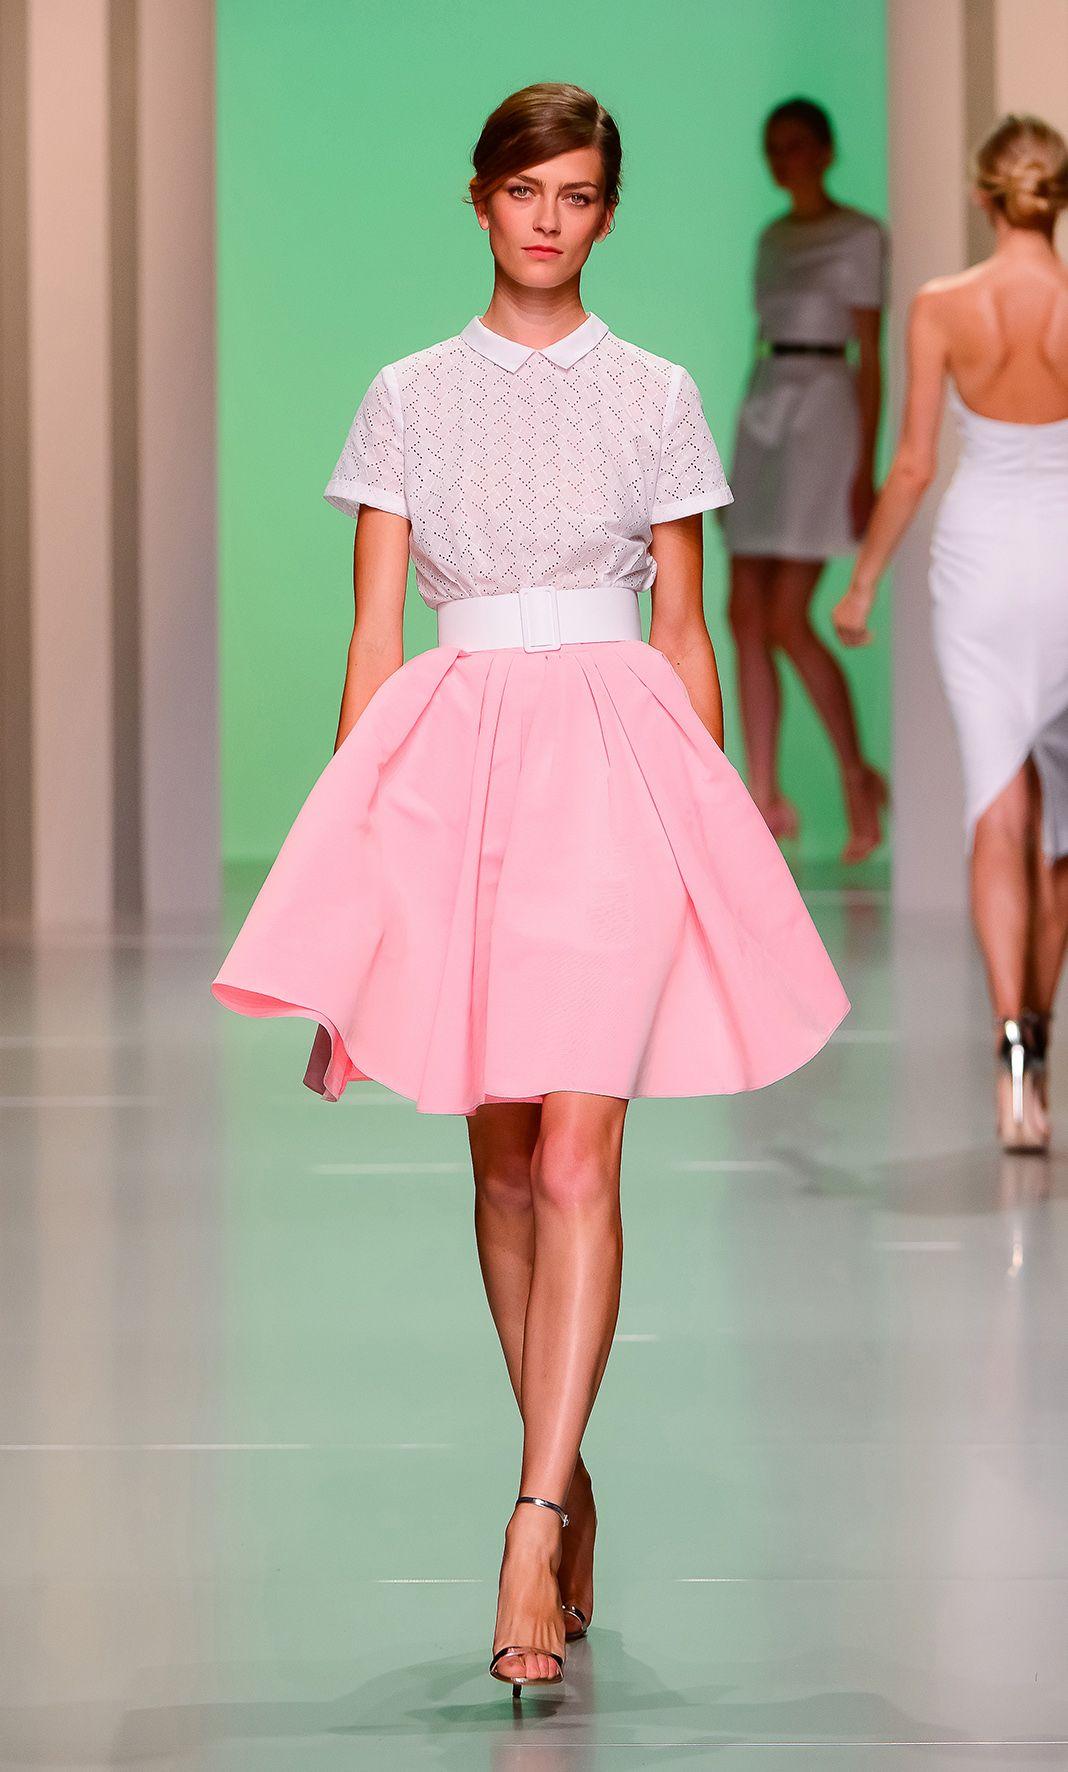 Love Fashion Ss Pinterest The Skirt Jarmon 2013 Tara qtvwRxUzg